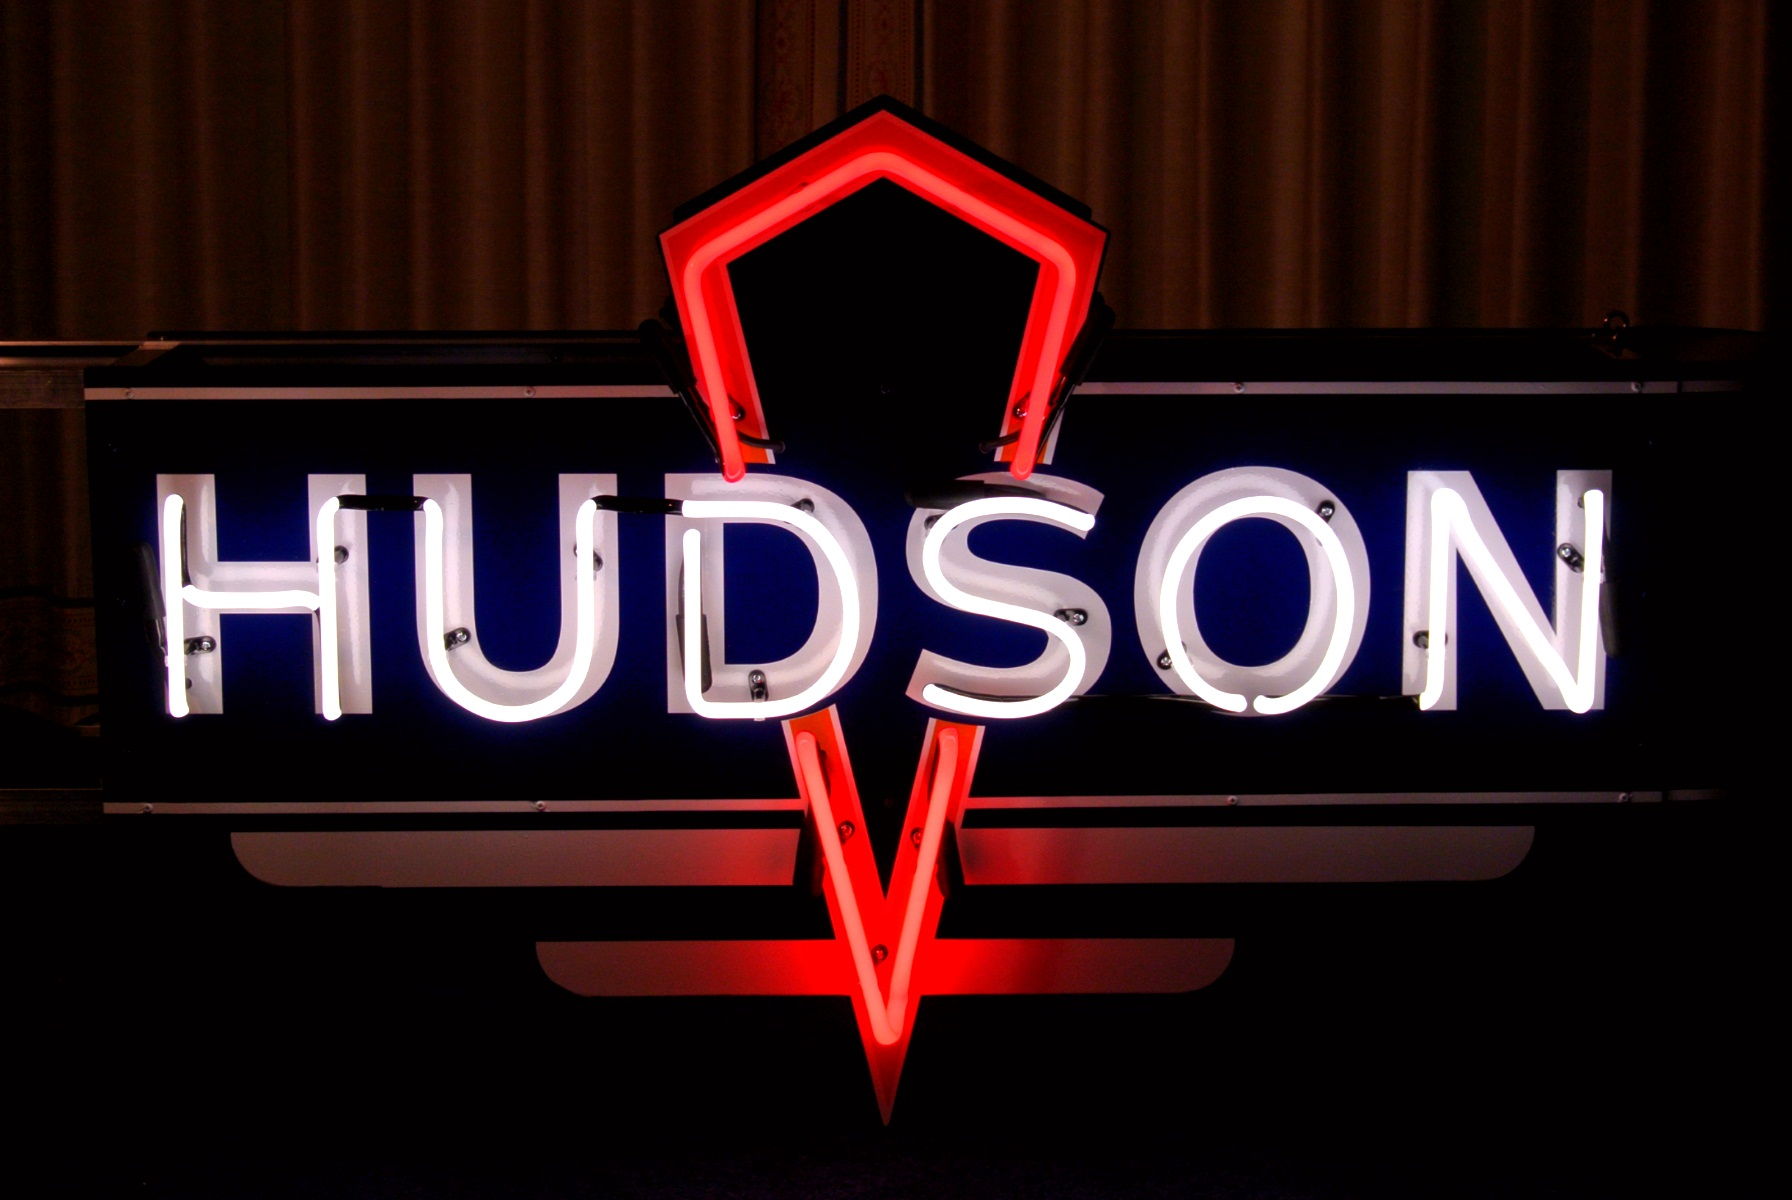 Hudson Dealership Animated Flashing Neon Sign